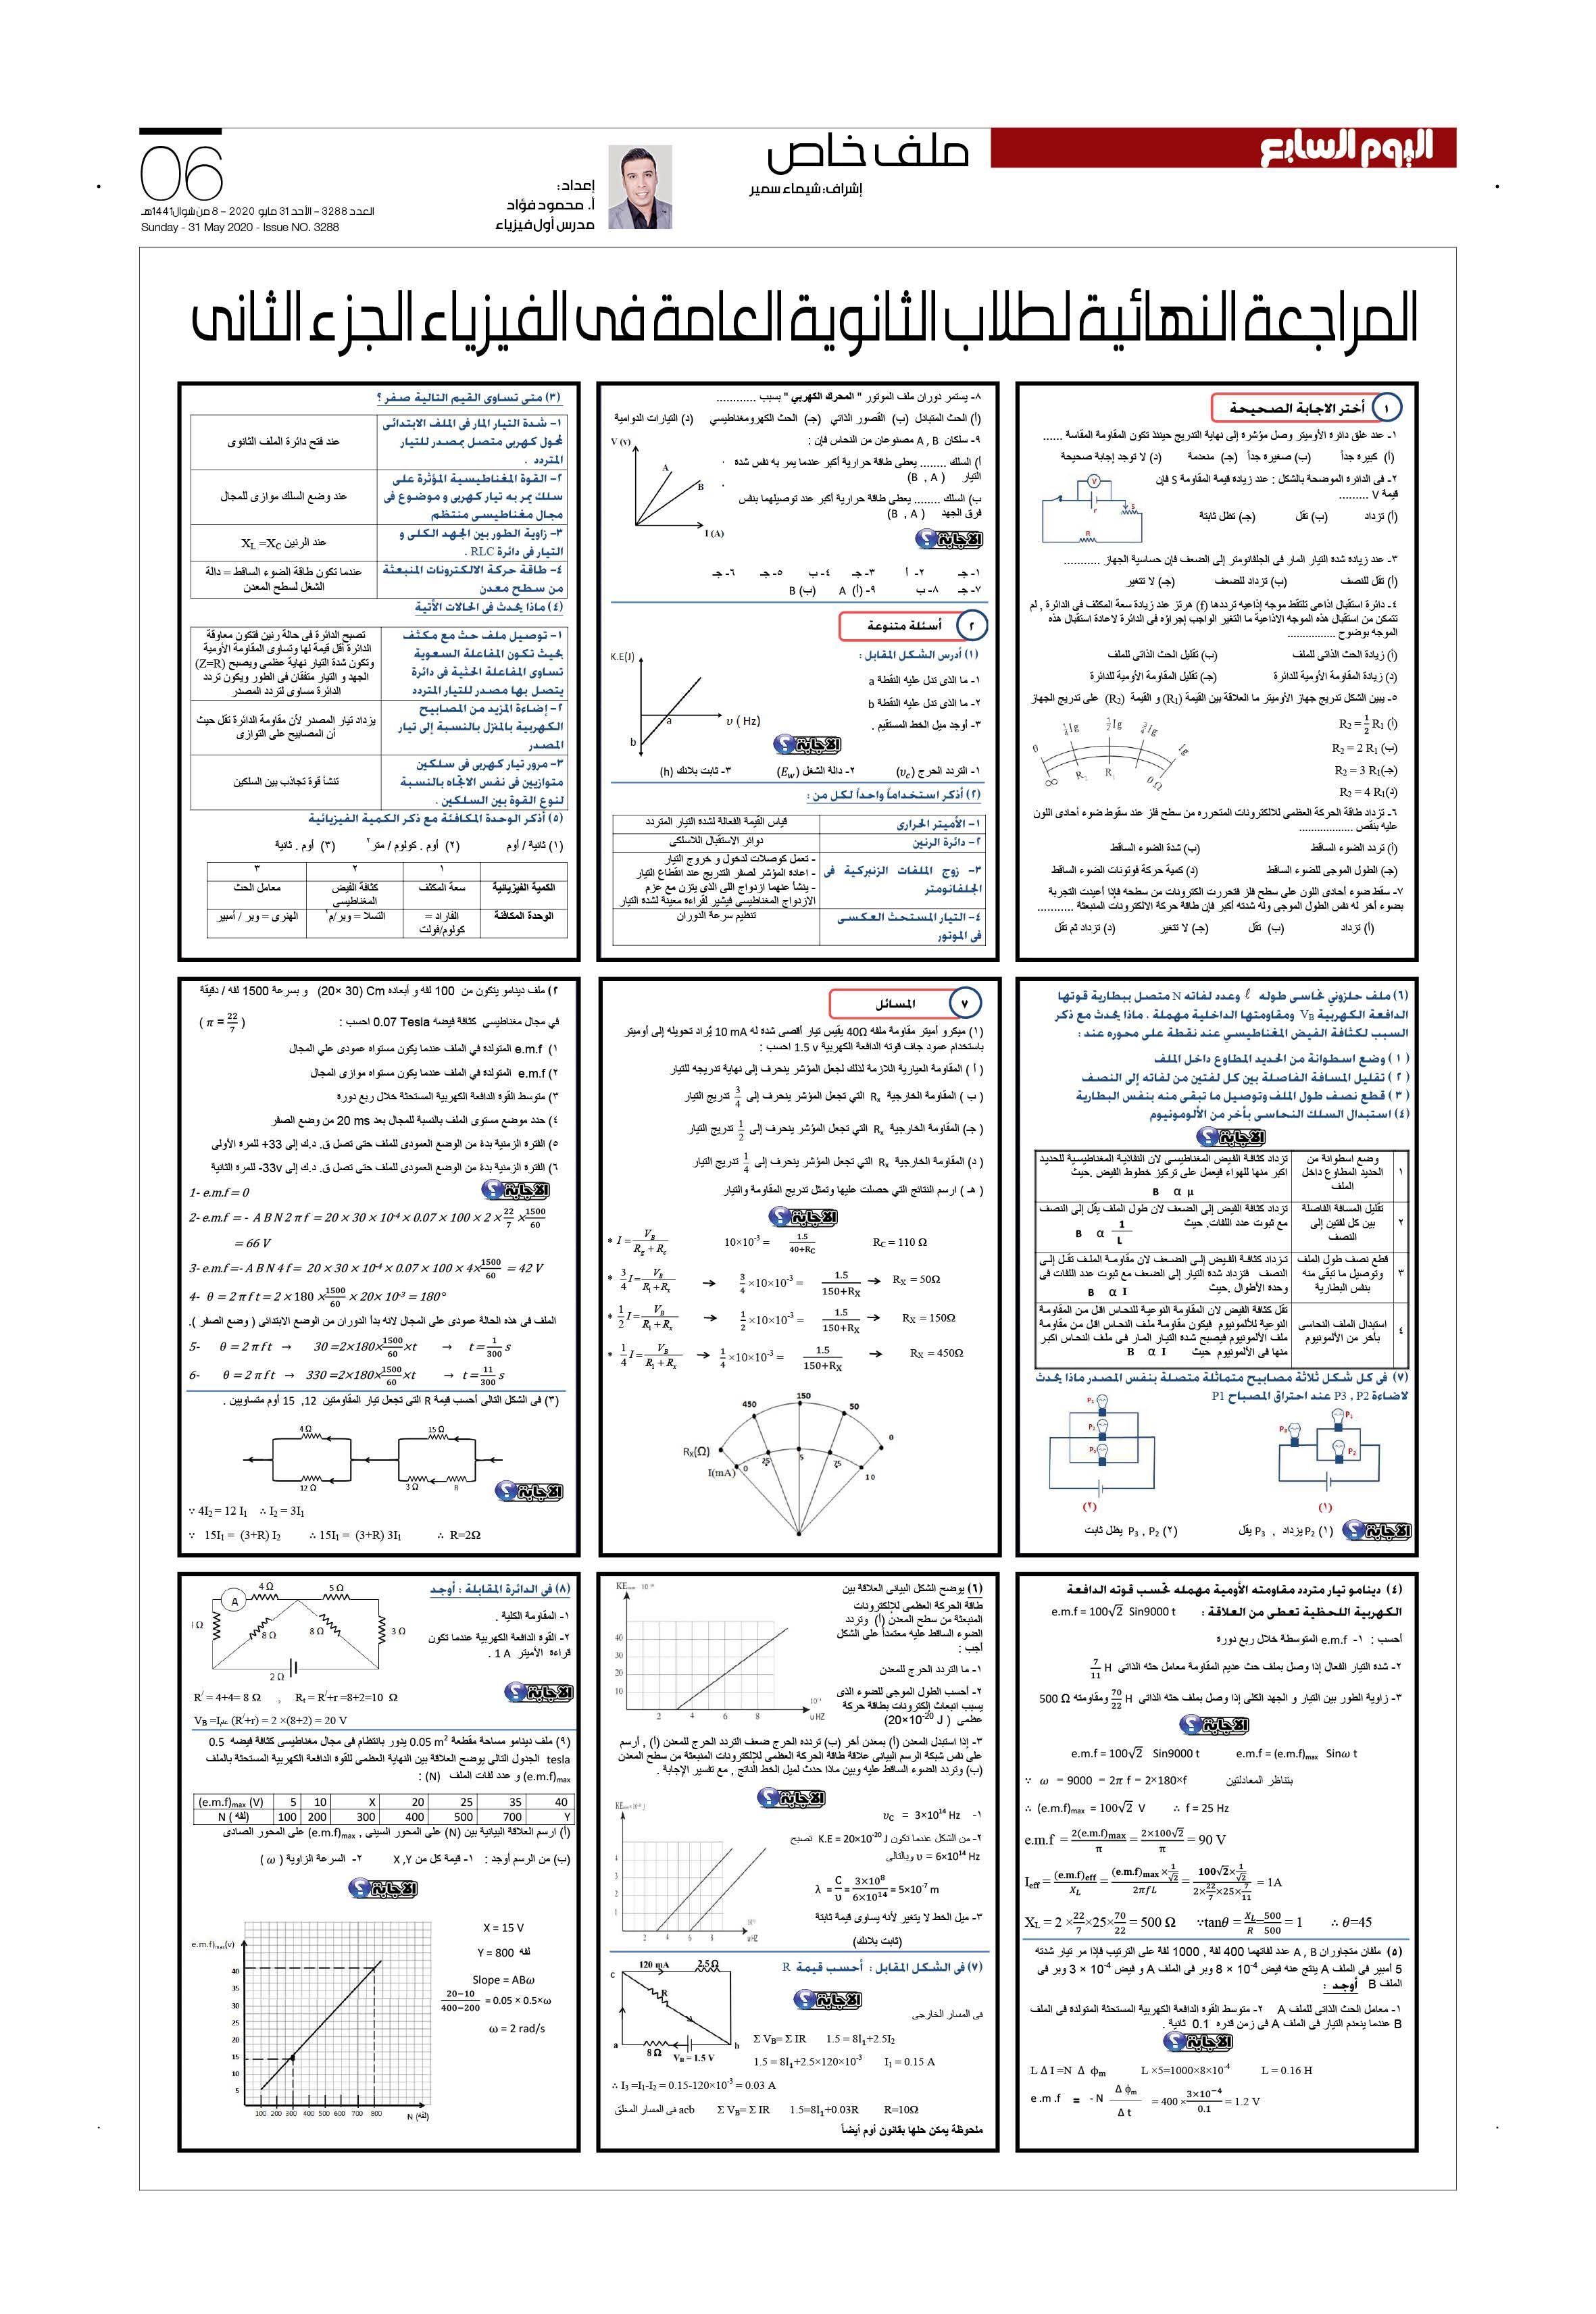 Arwa مراجعة مادة الفيزياء الثانوية العامة 2020م Ebooks Free Books Physics Free Ebooks